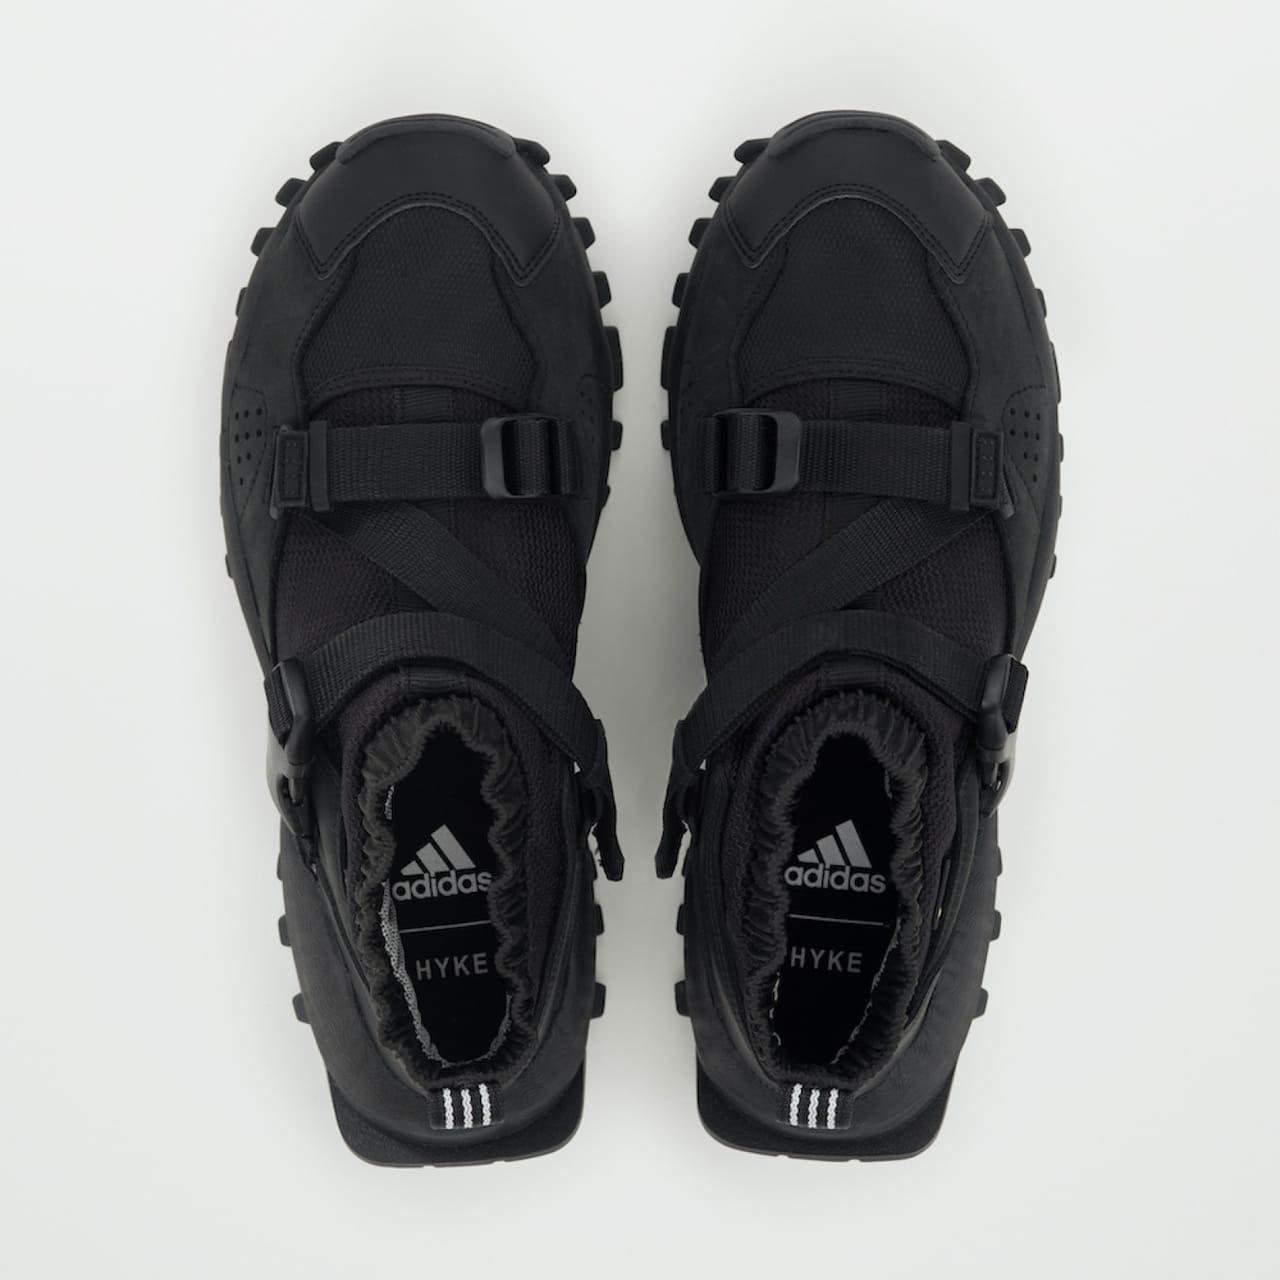 HYKE x adidas Fall/Winter 2020 Collab